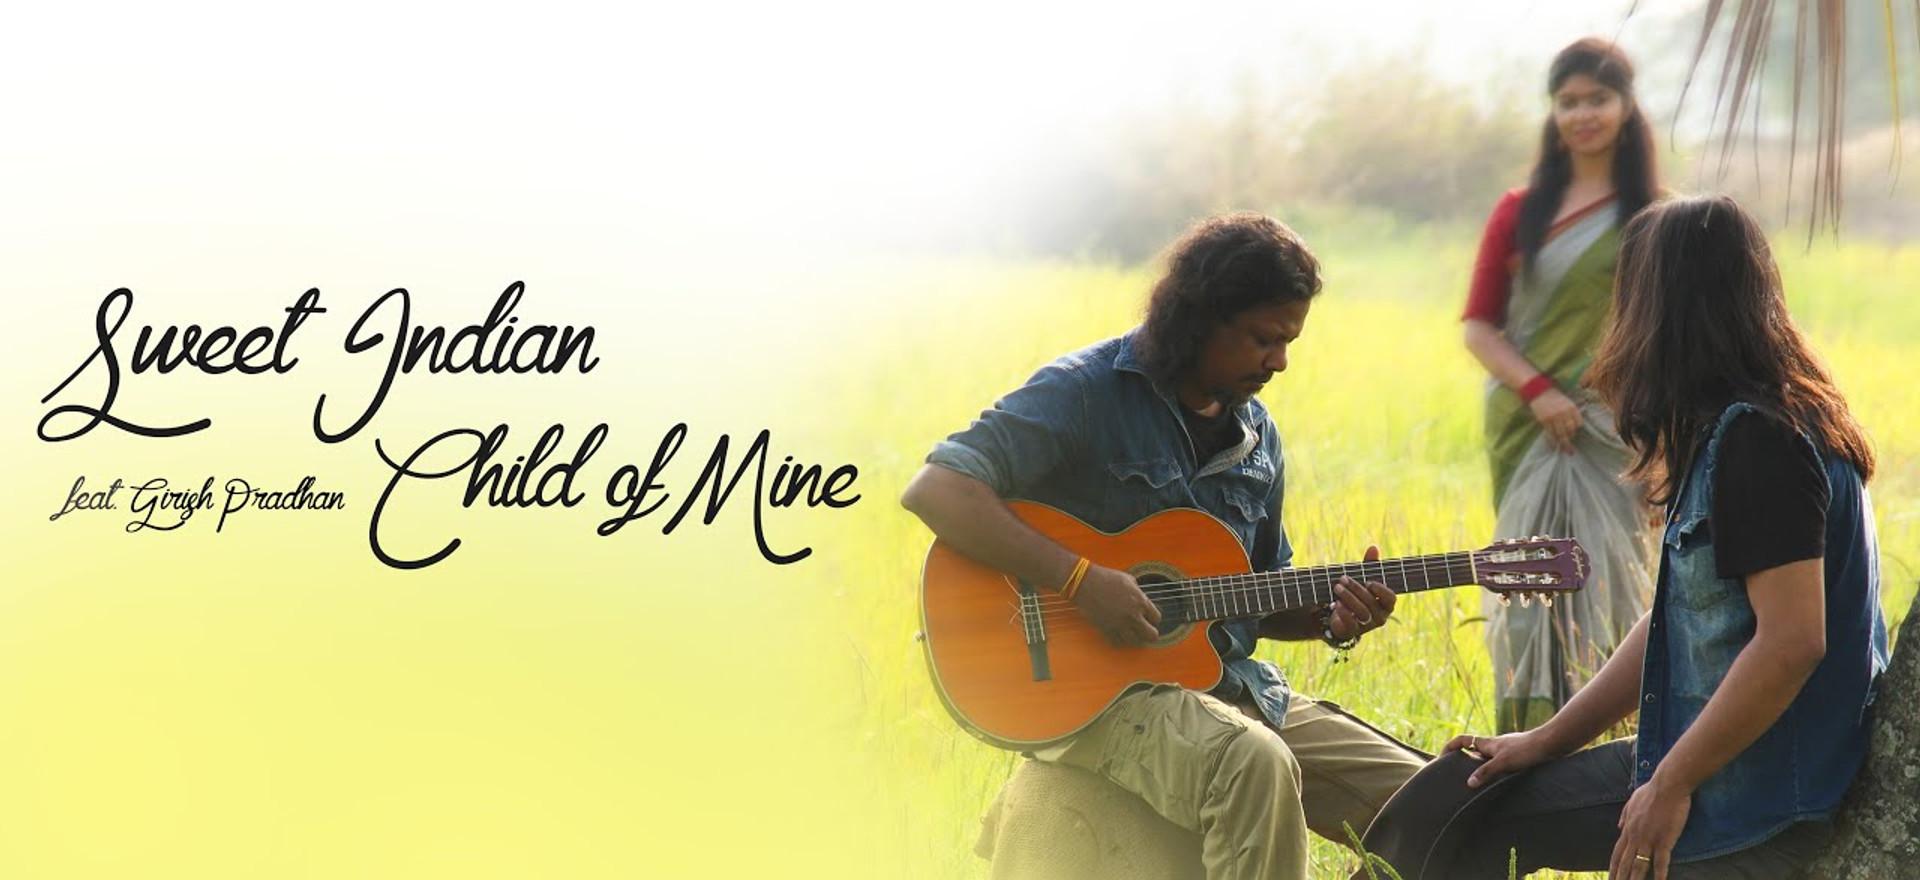 Sweet Indian Child of Mine | Baiju Dharmajan | Girish Pradhan